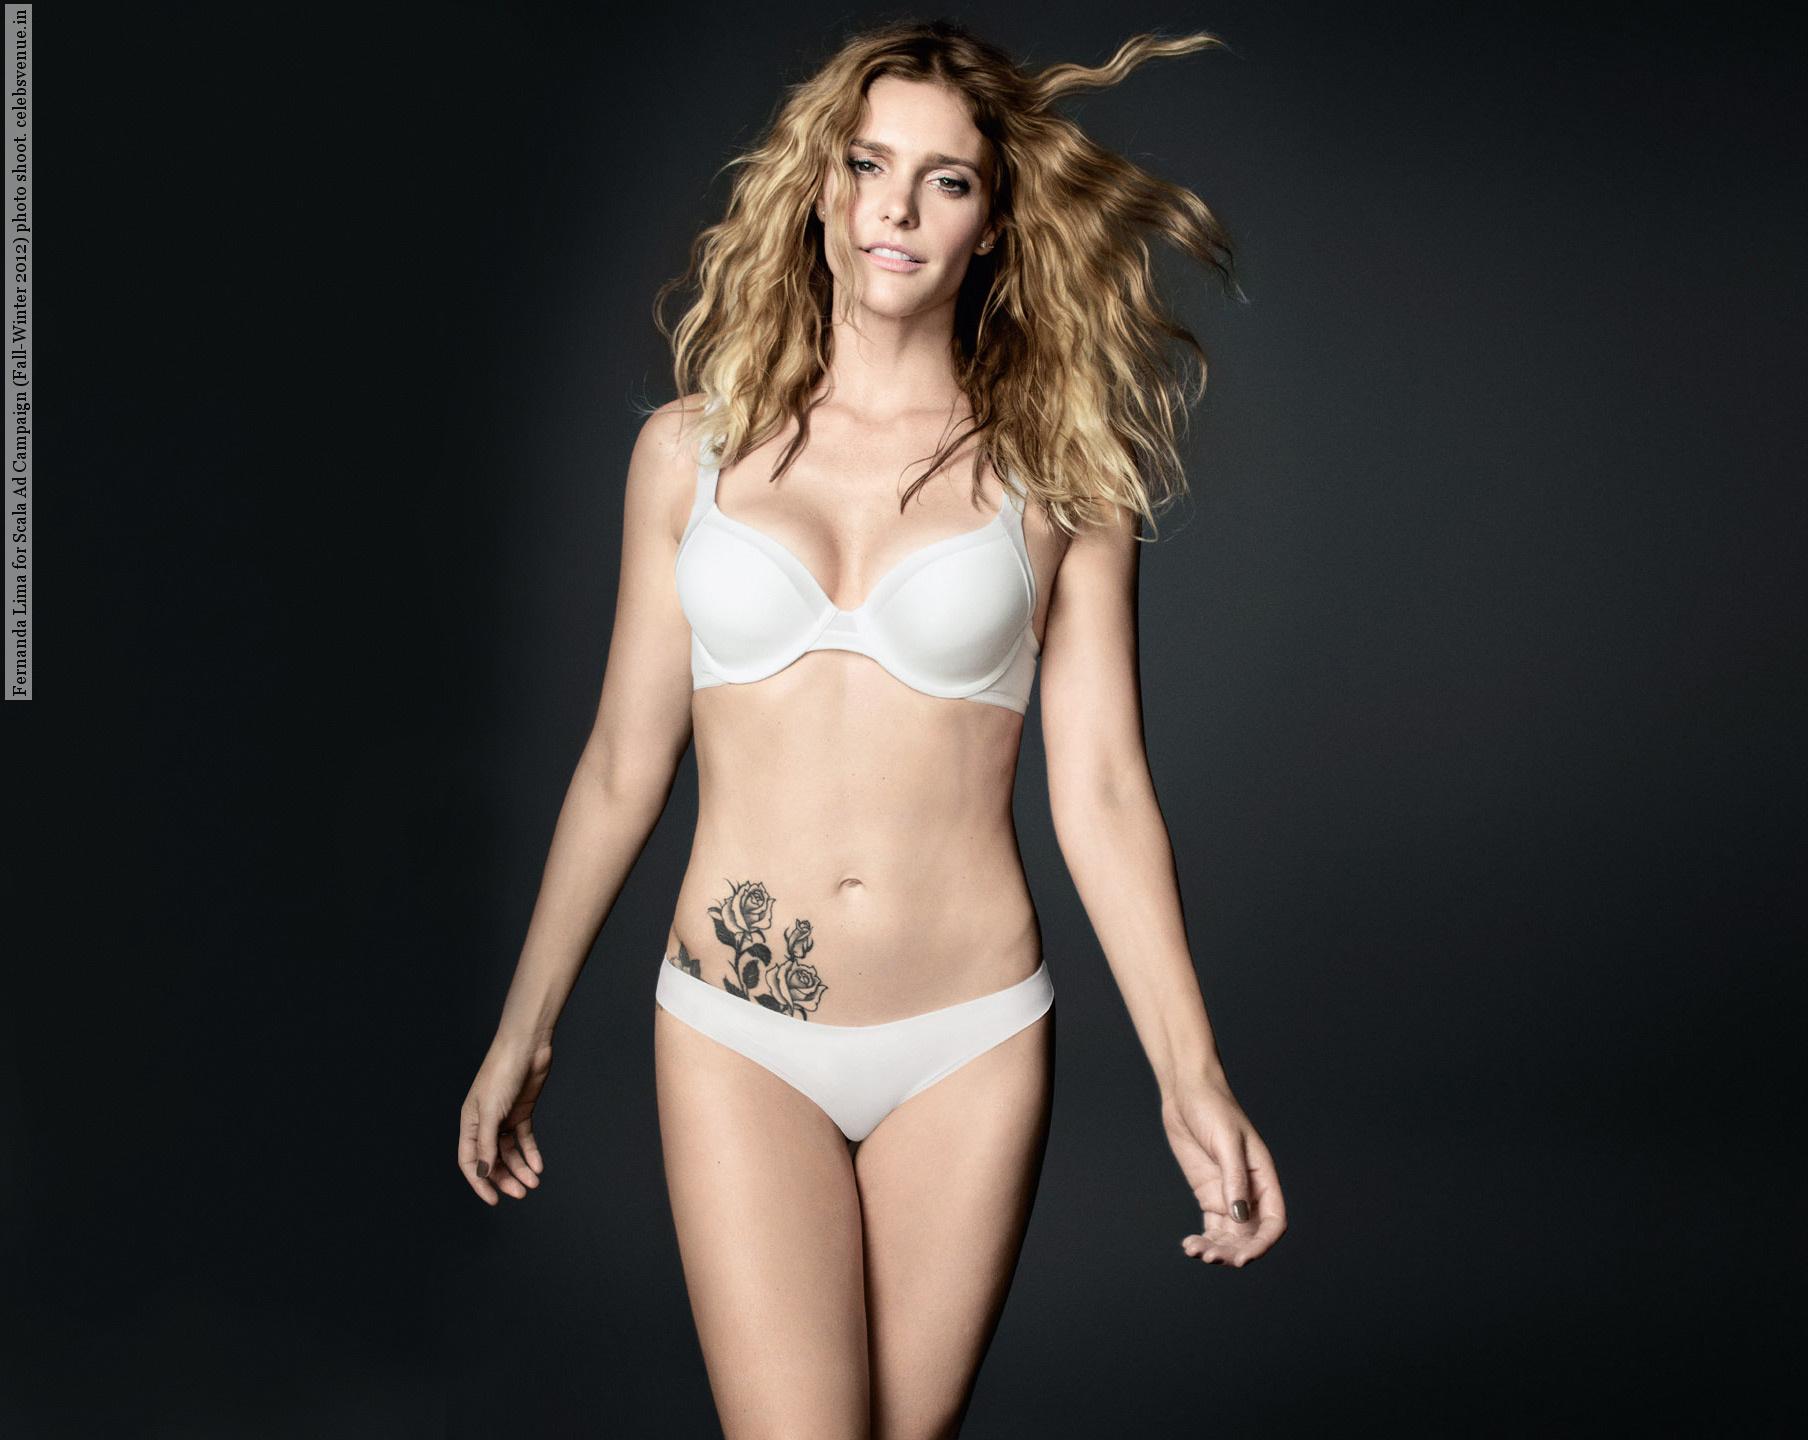 Fernanda Lima en lingerie